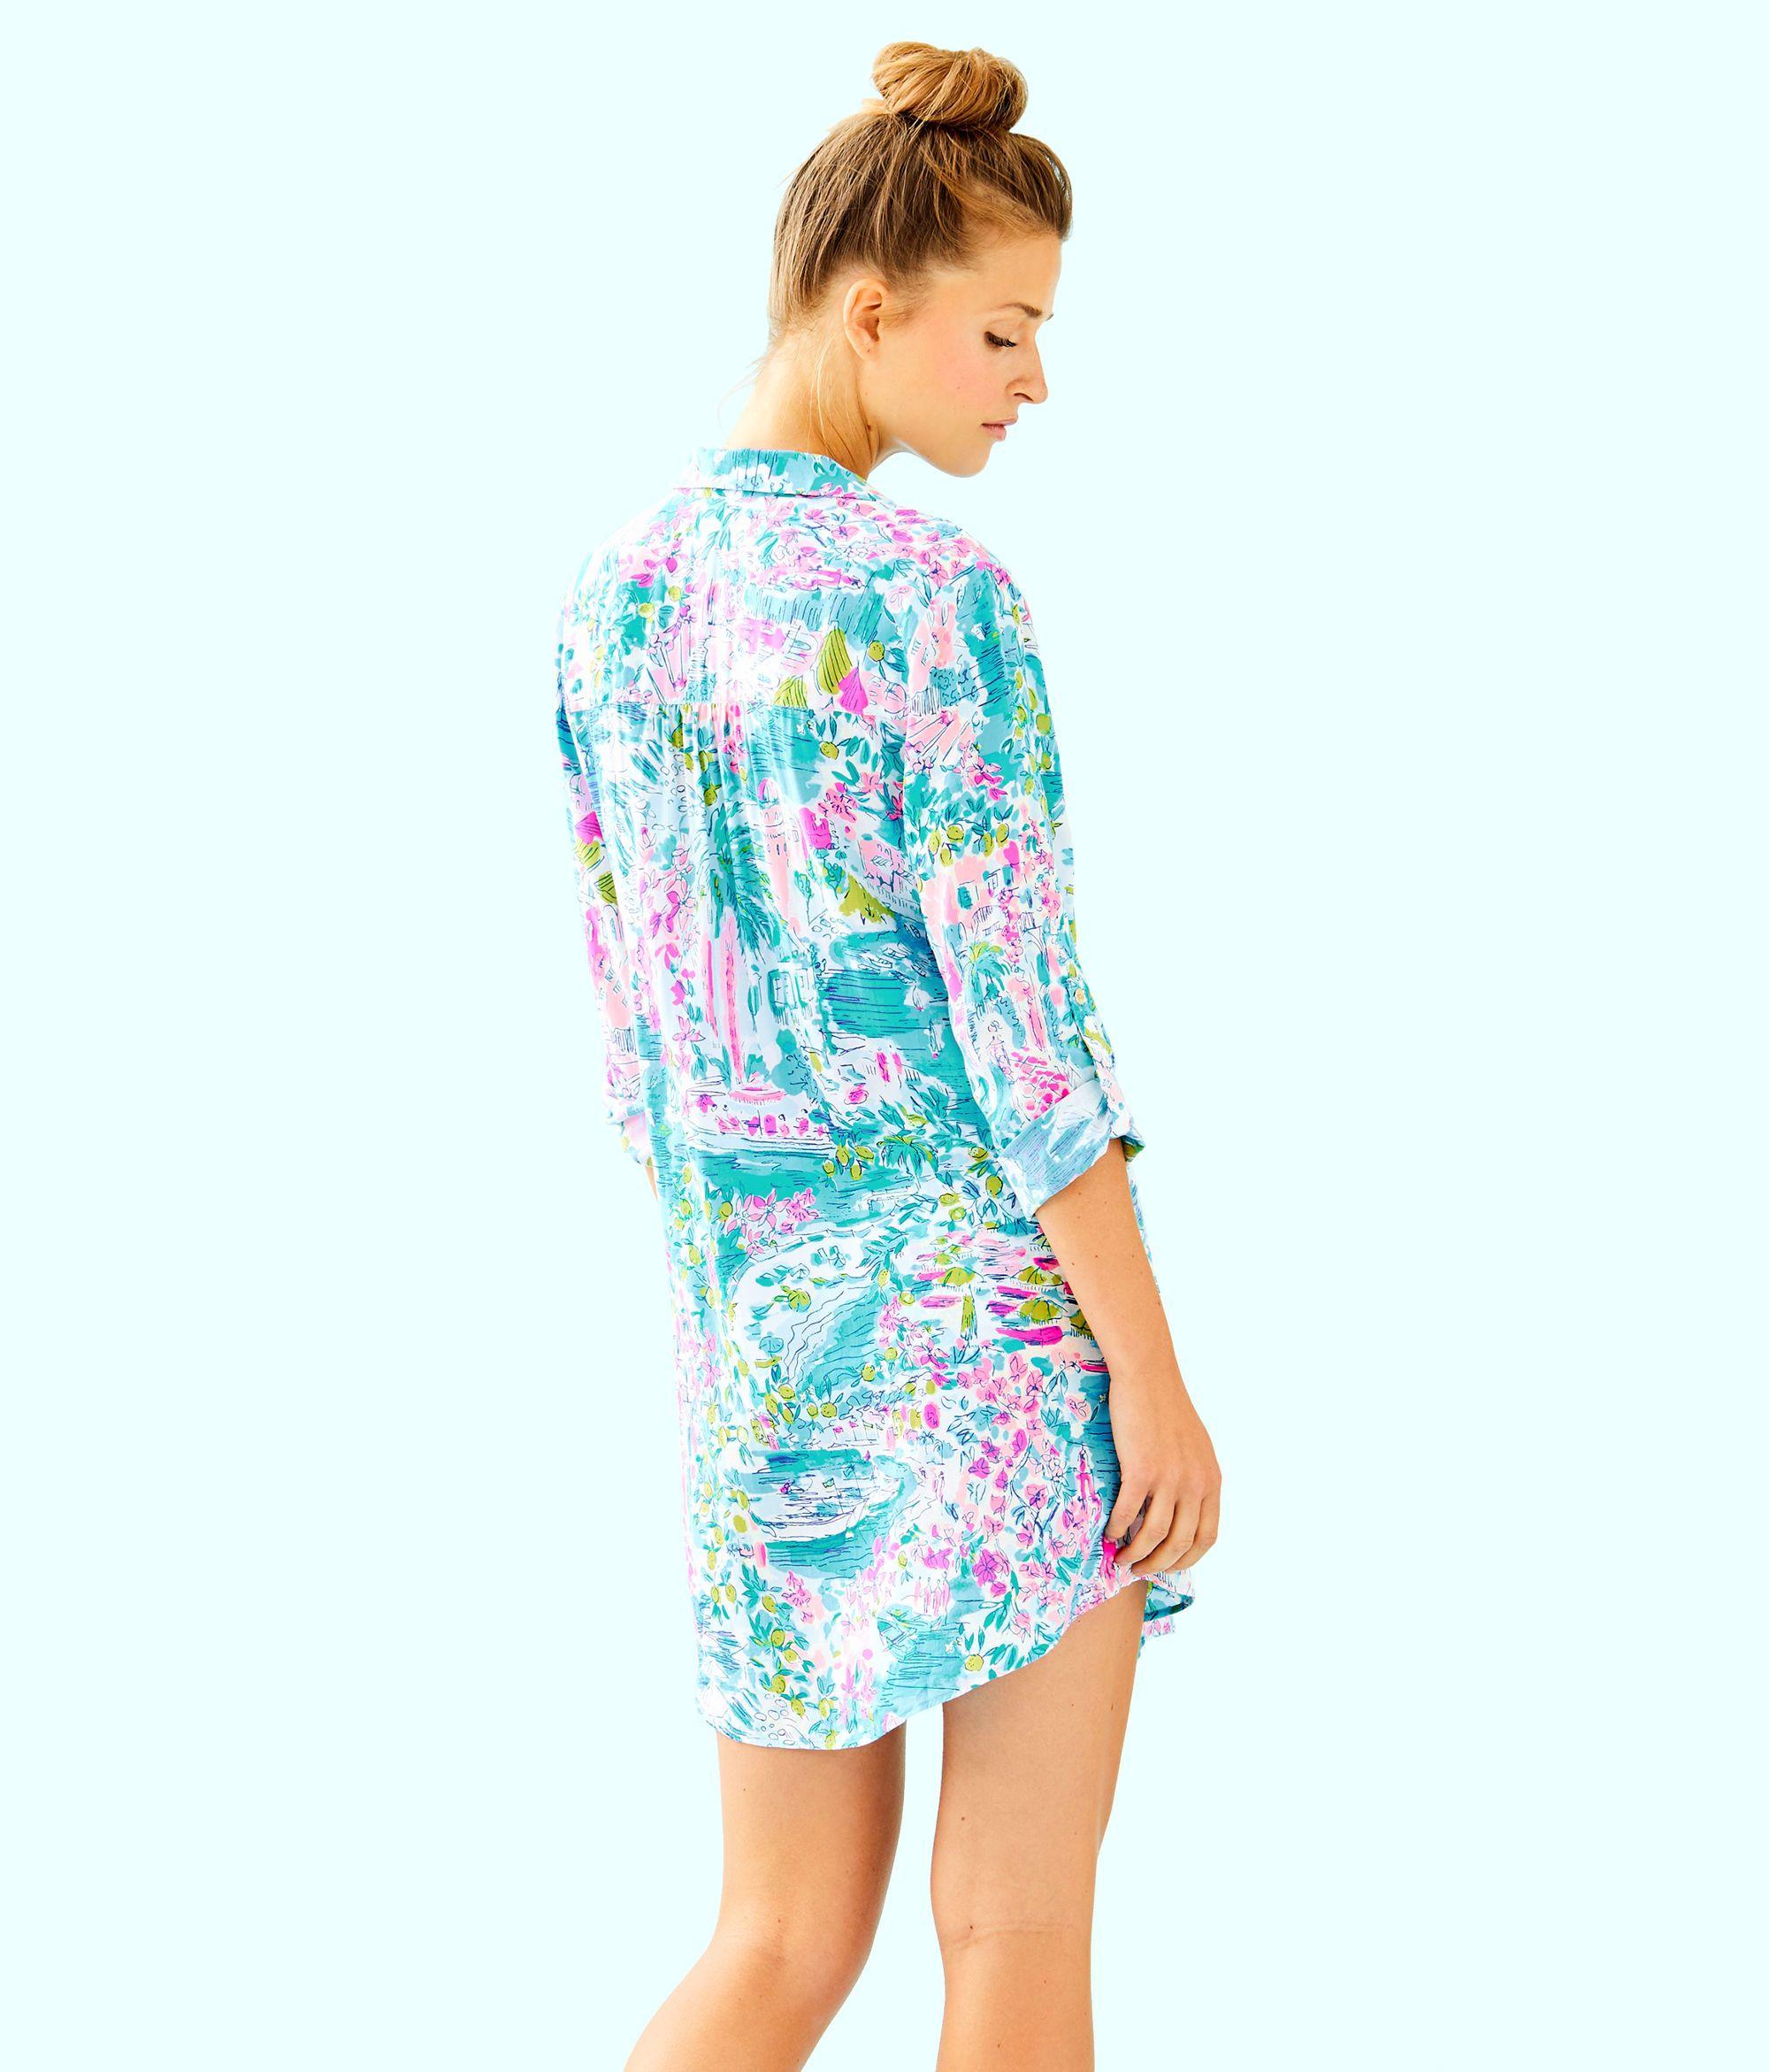 f23a26b273ca8 Natalie Shirtdress Cover Up